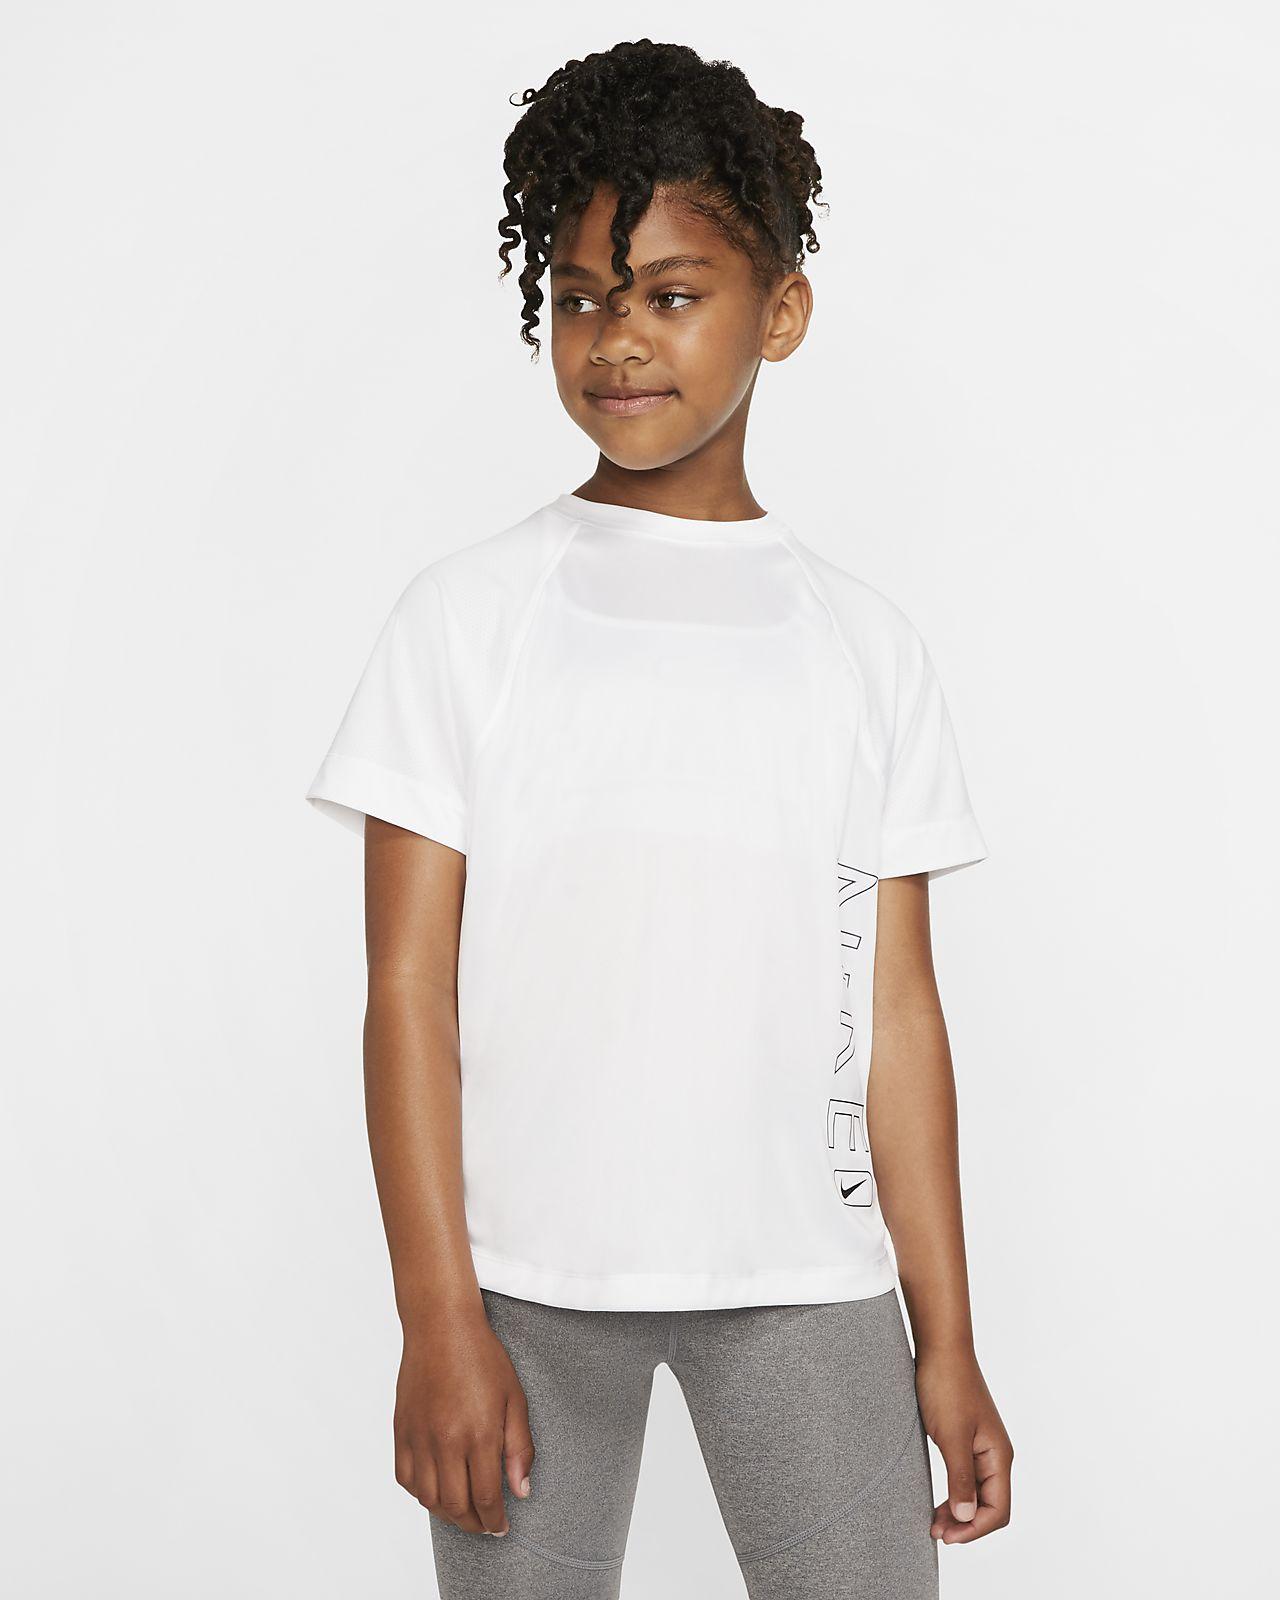 Nike Dri-FIT Kurzarm-Trainingsoberteil mit Grafik für ältere Kinder (Mädchen)